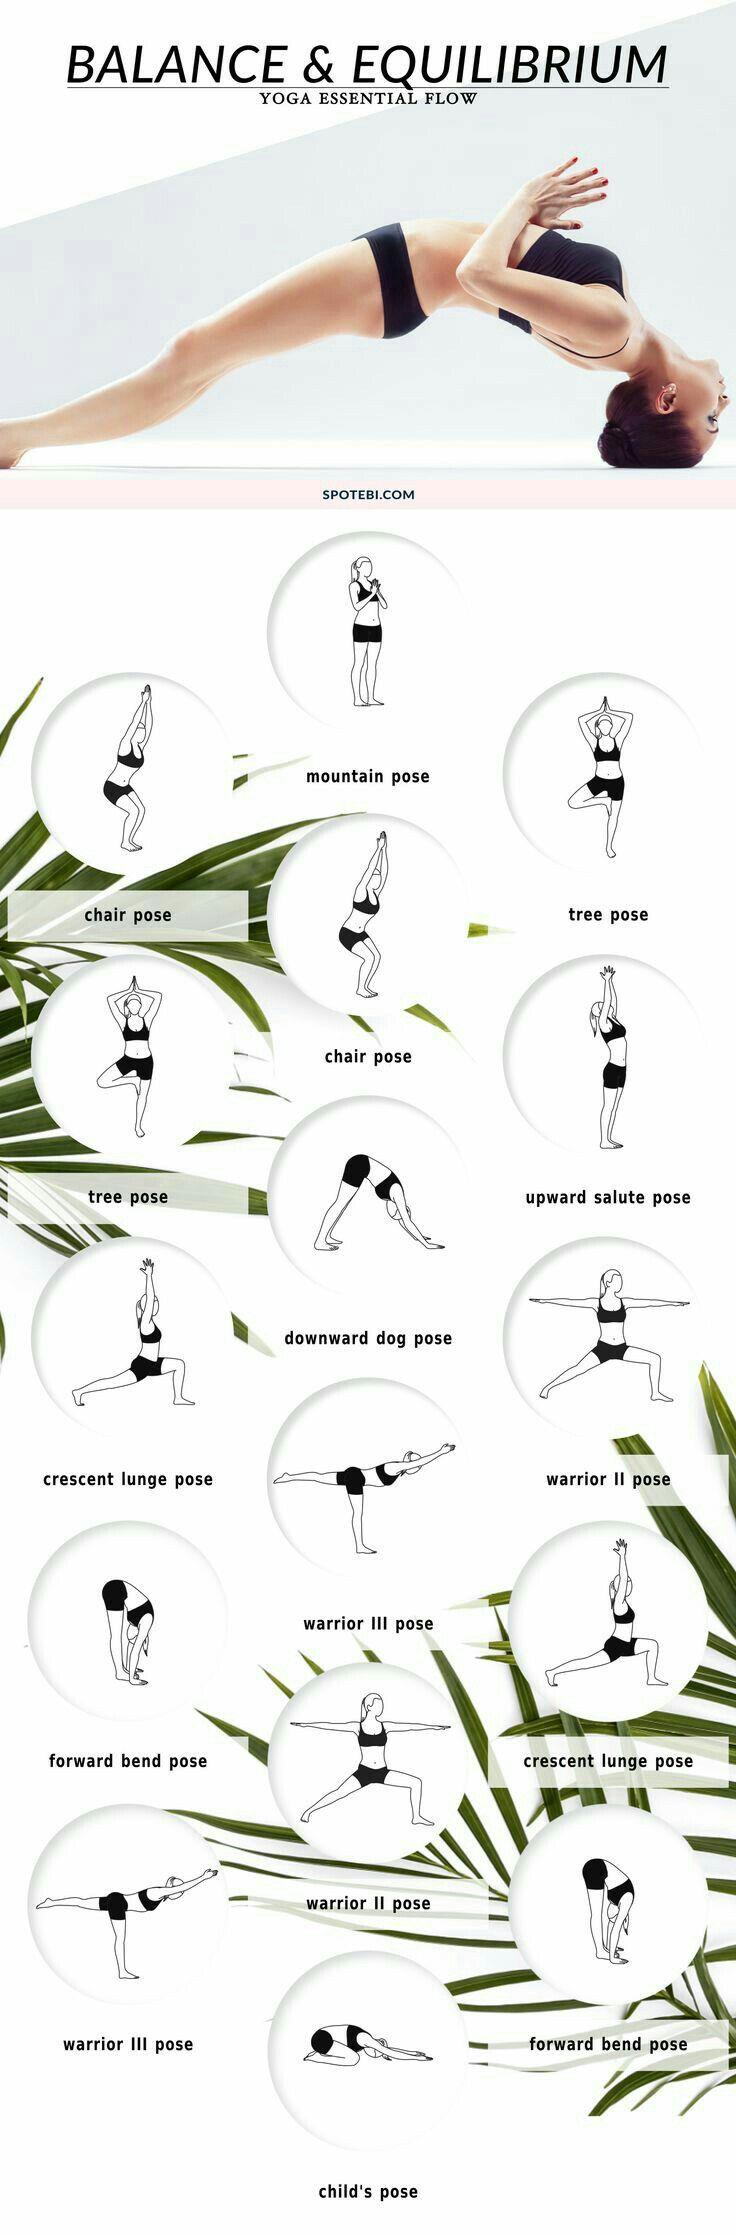 Balance & Equilibrium Yoga Sequence